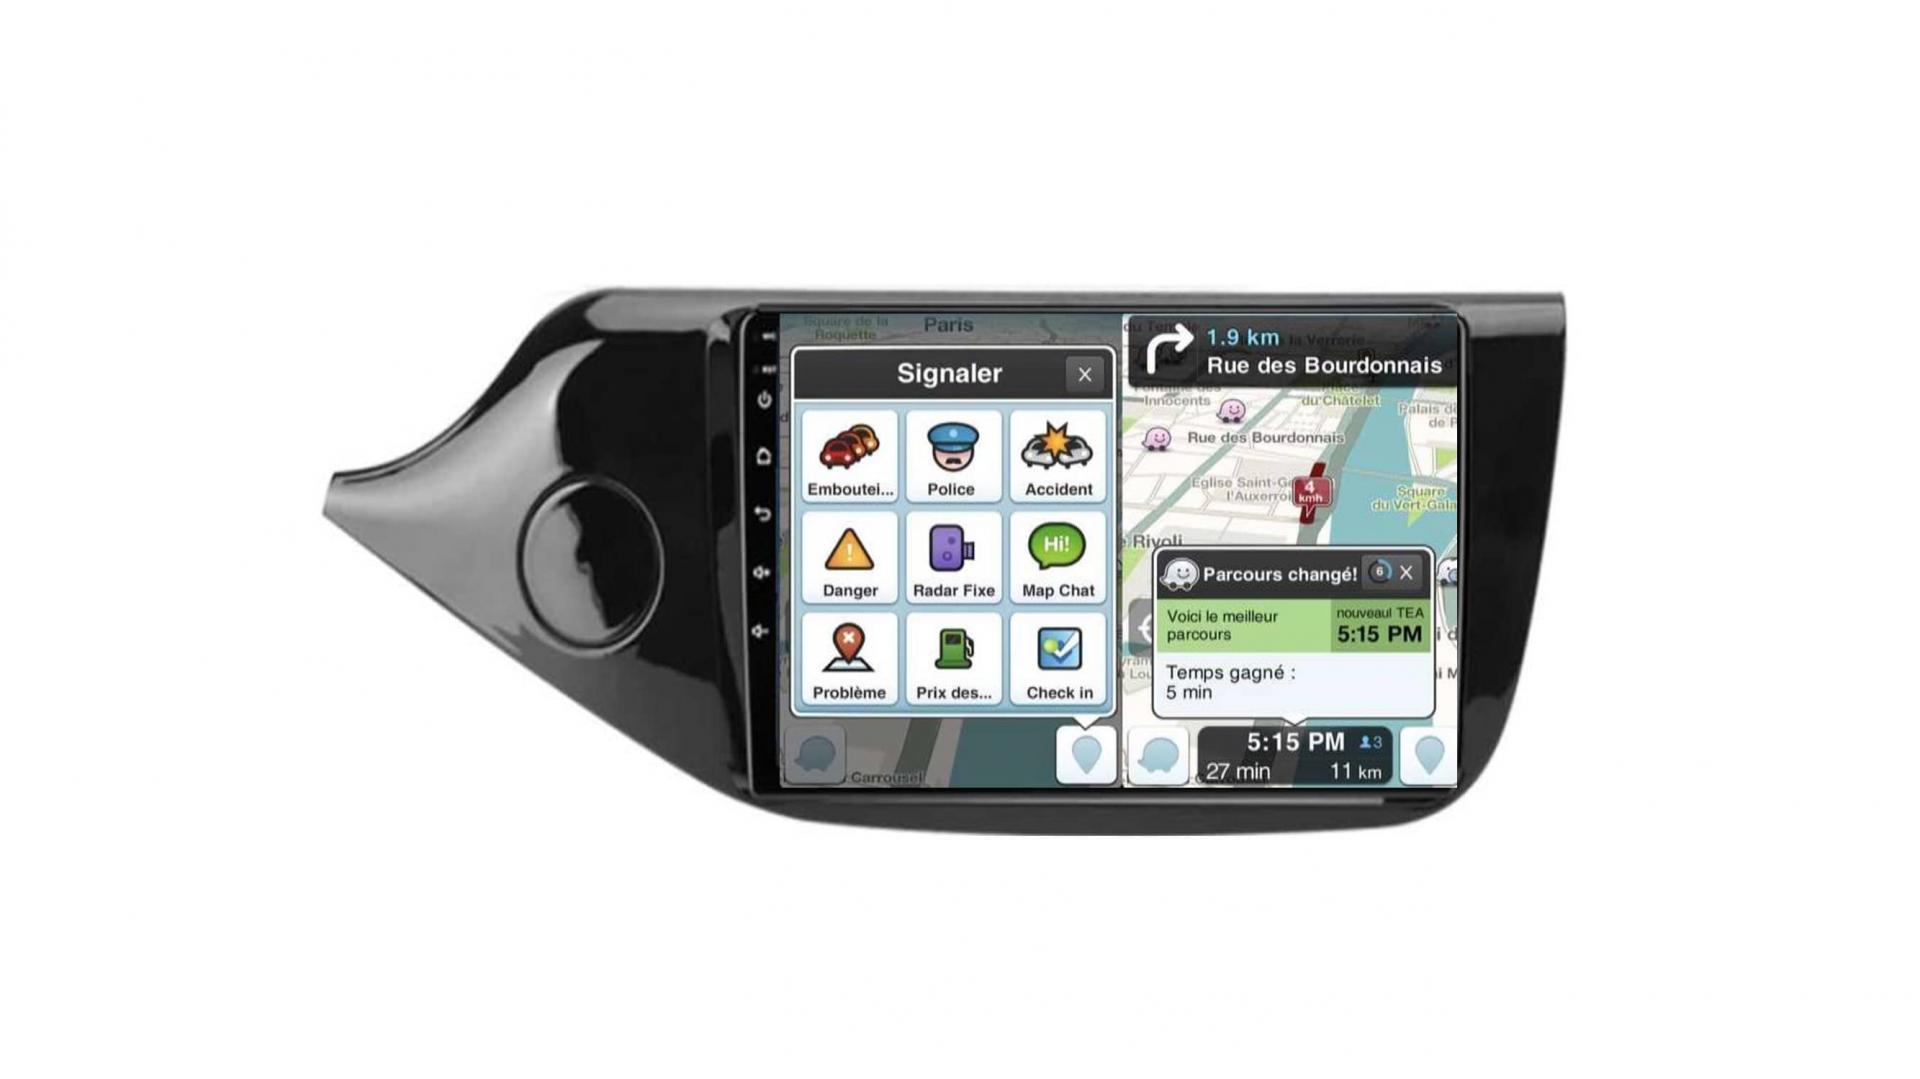 Kia ceed autoradio gps bluetooth android auto carplay camera de recul wifi commande au volant3